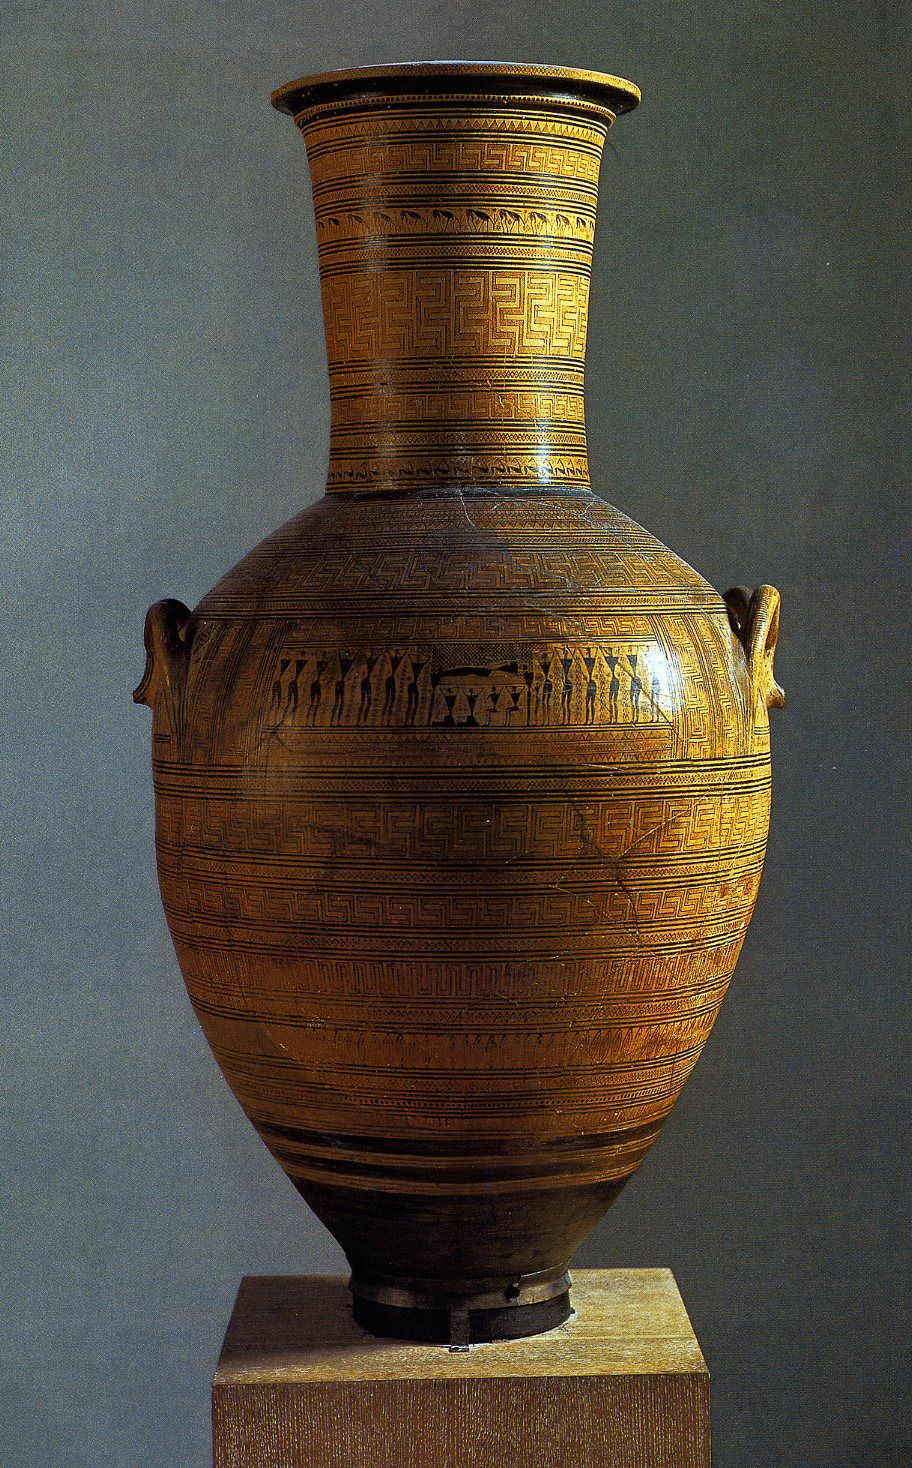 Diylon Amphora greek geometric style storage jar 750 BCE http://www.proprofs.com/flashcards/cardshowall.php?title=ancient-greek-art